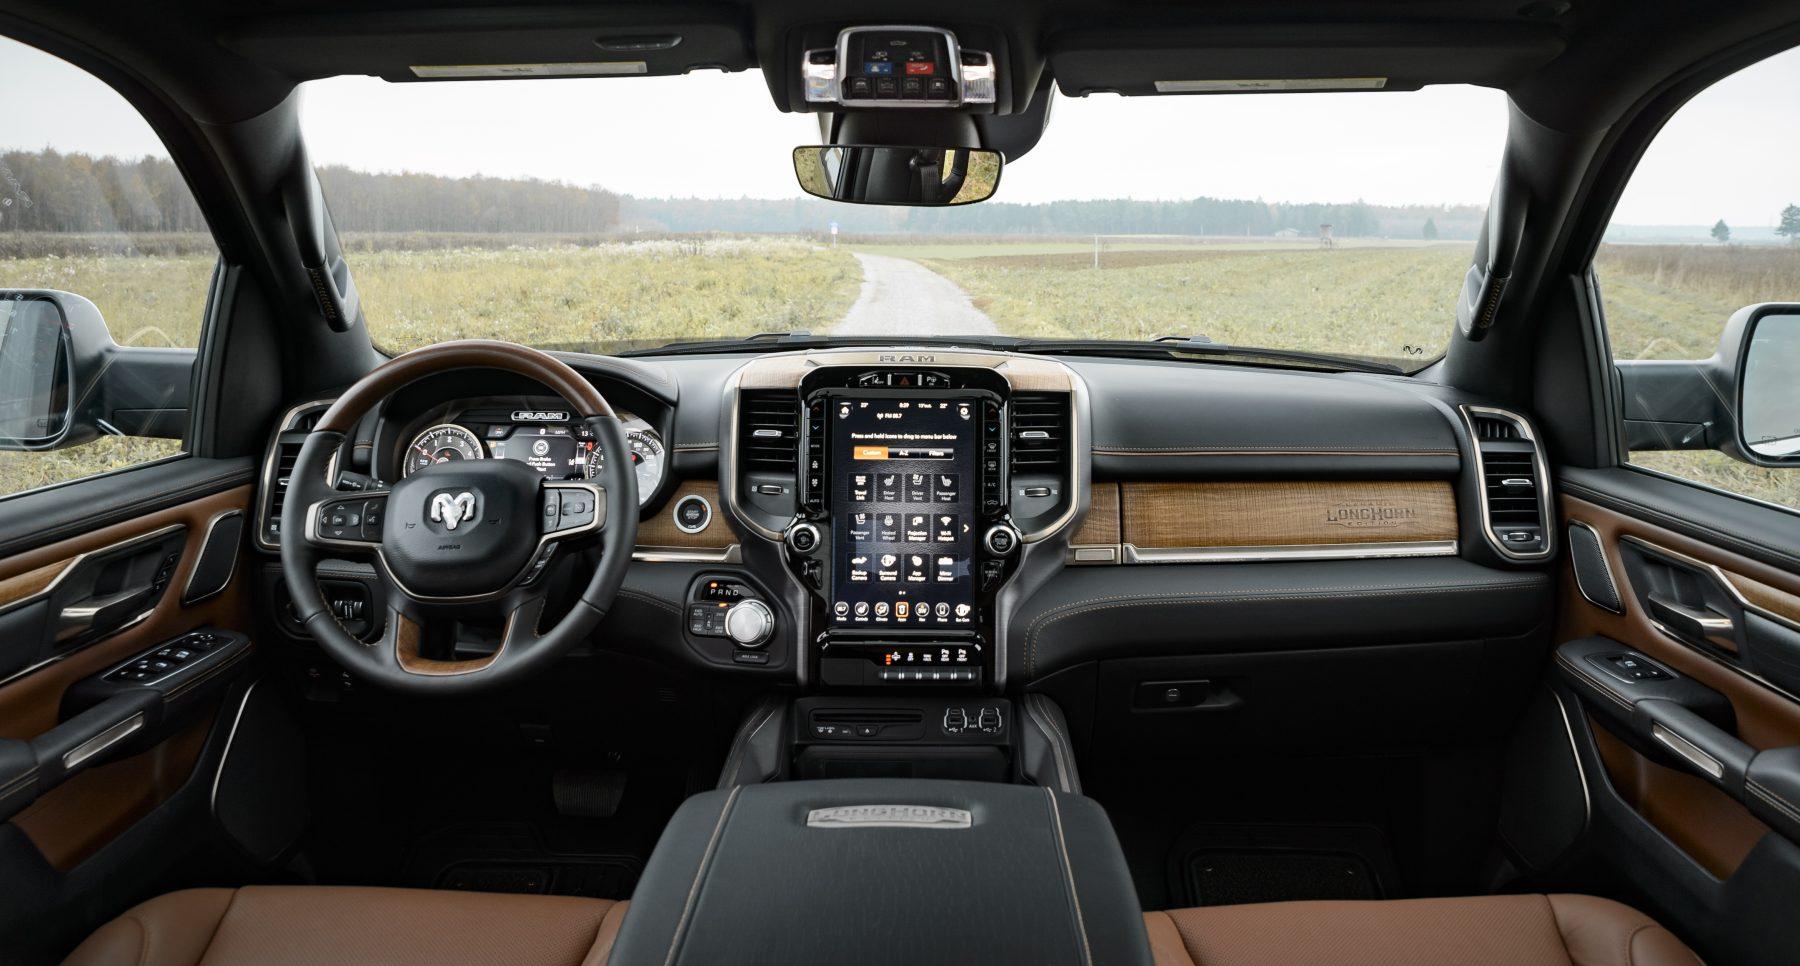 2019 Ram 1500 Peicher Automotive